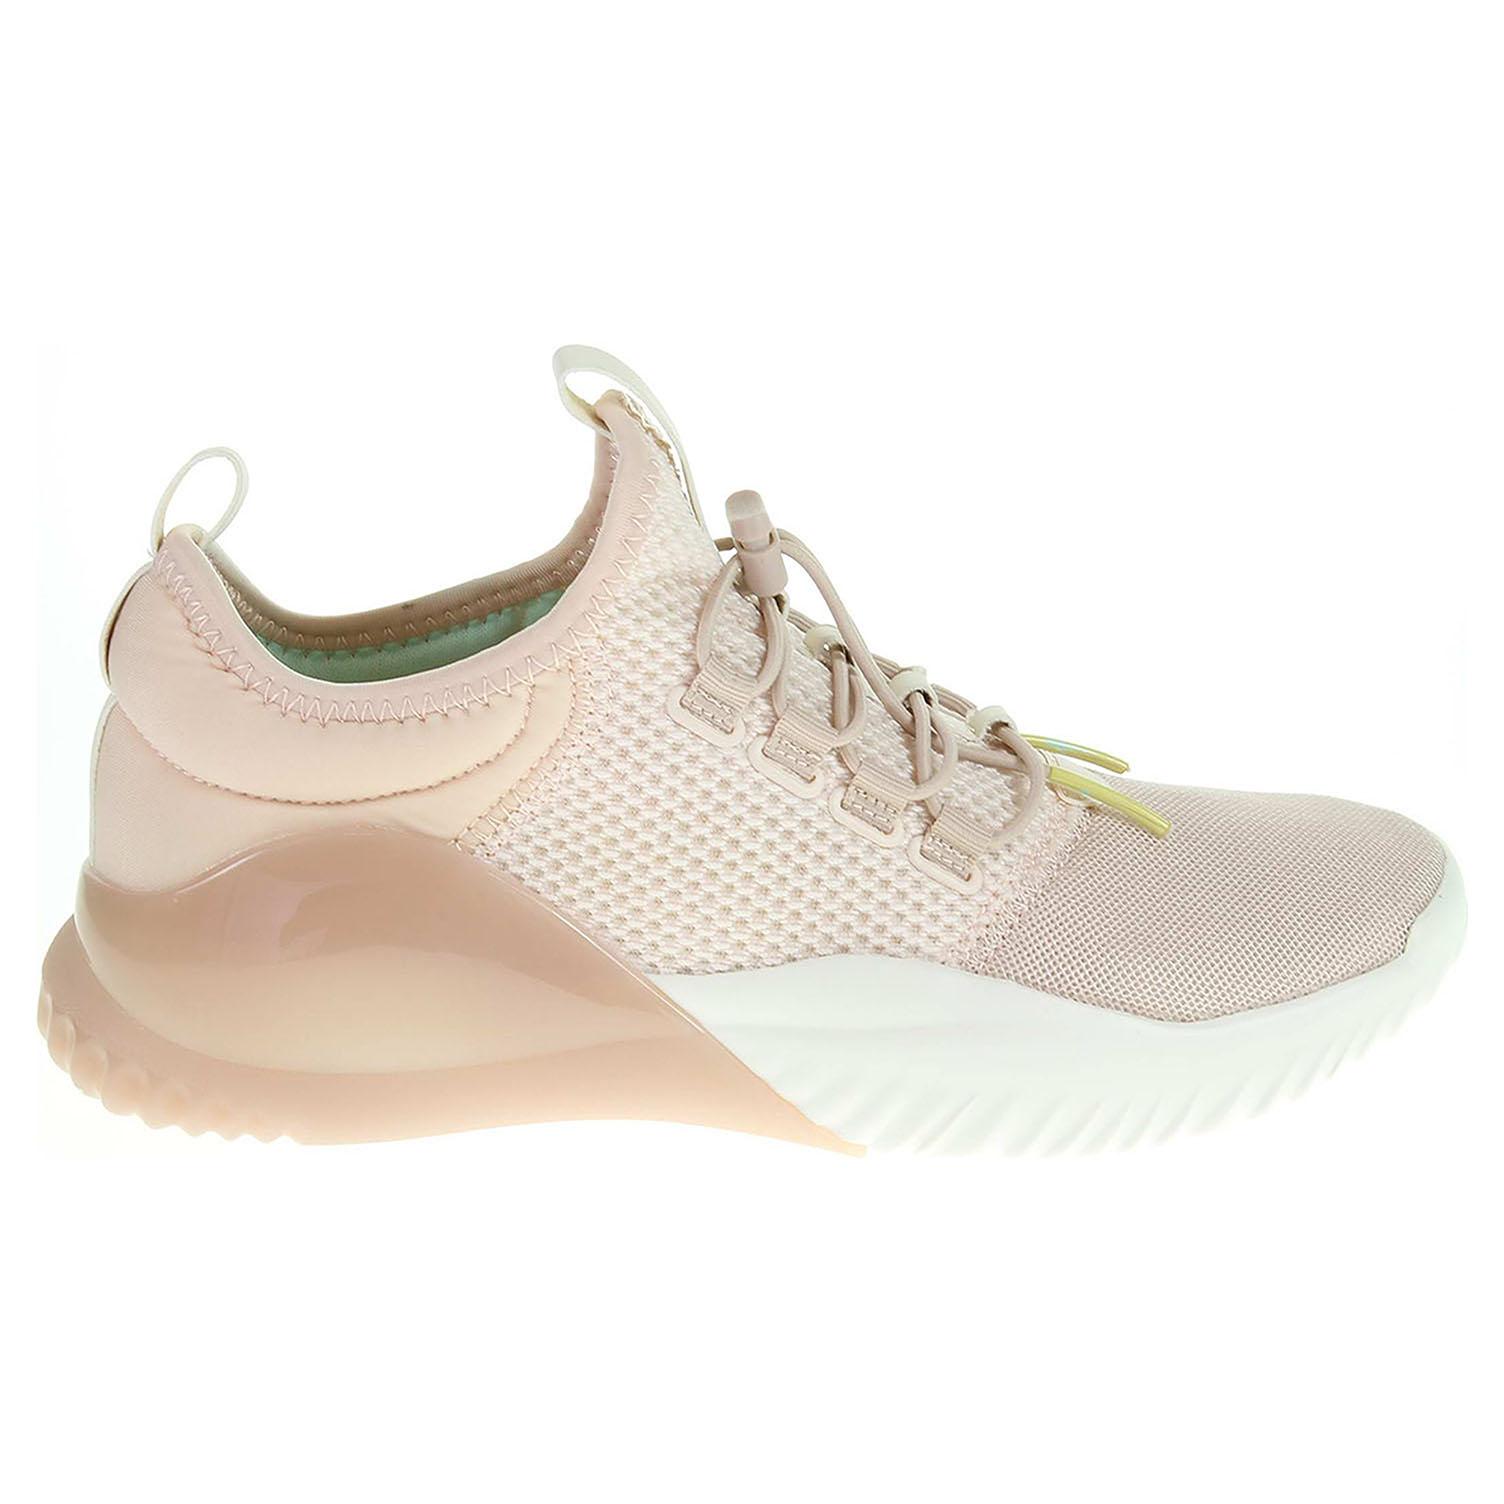 Ecco Tamaris dámská obuv 1-23720-20 light pink 23100586 4f2da47a431